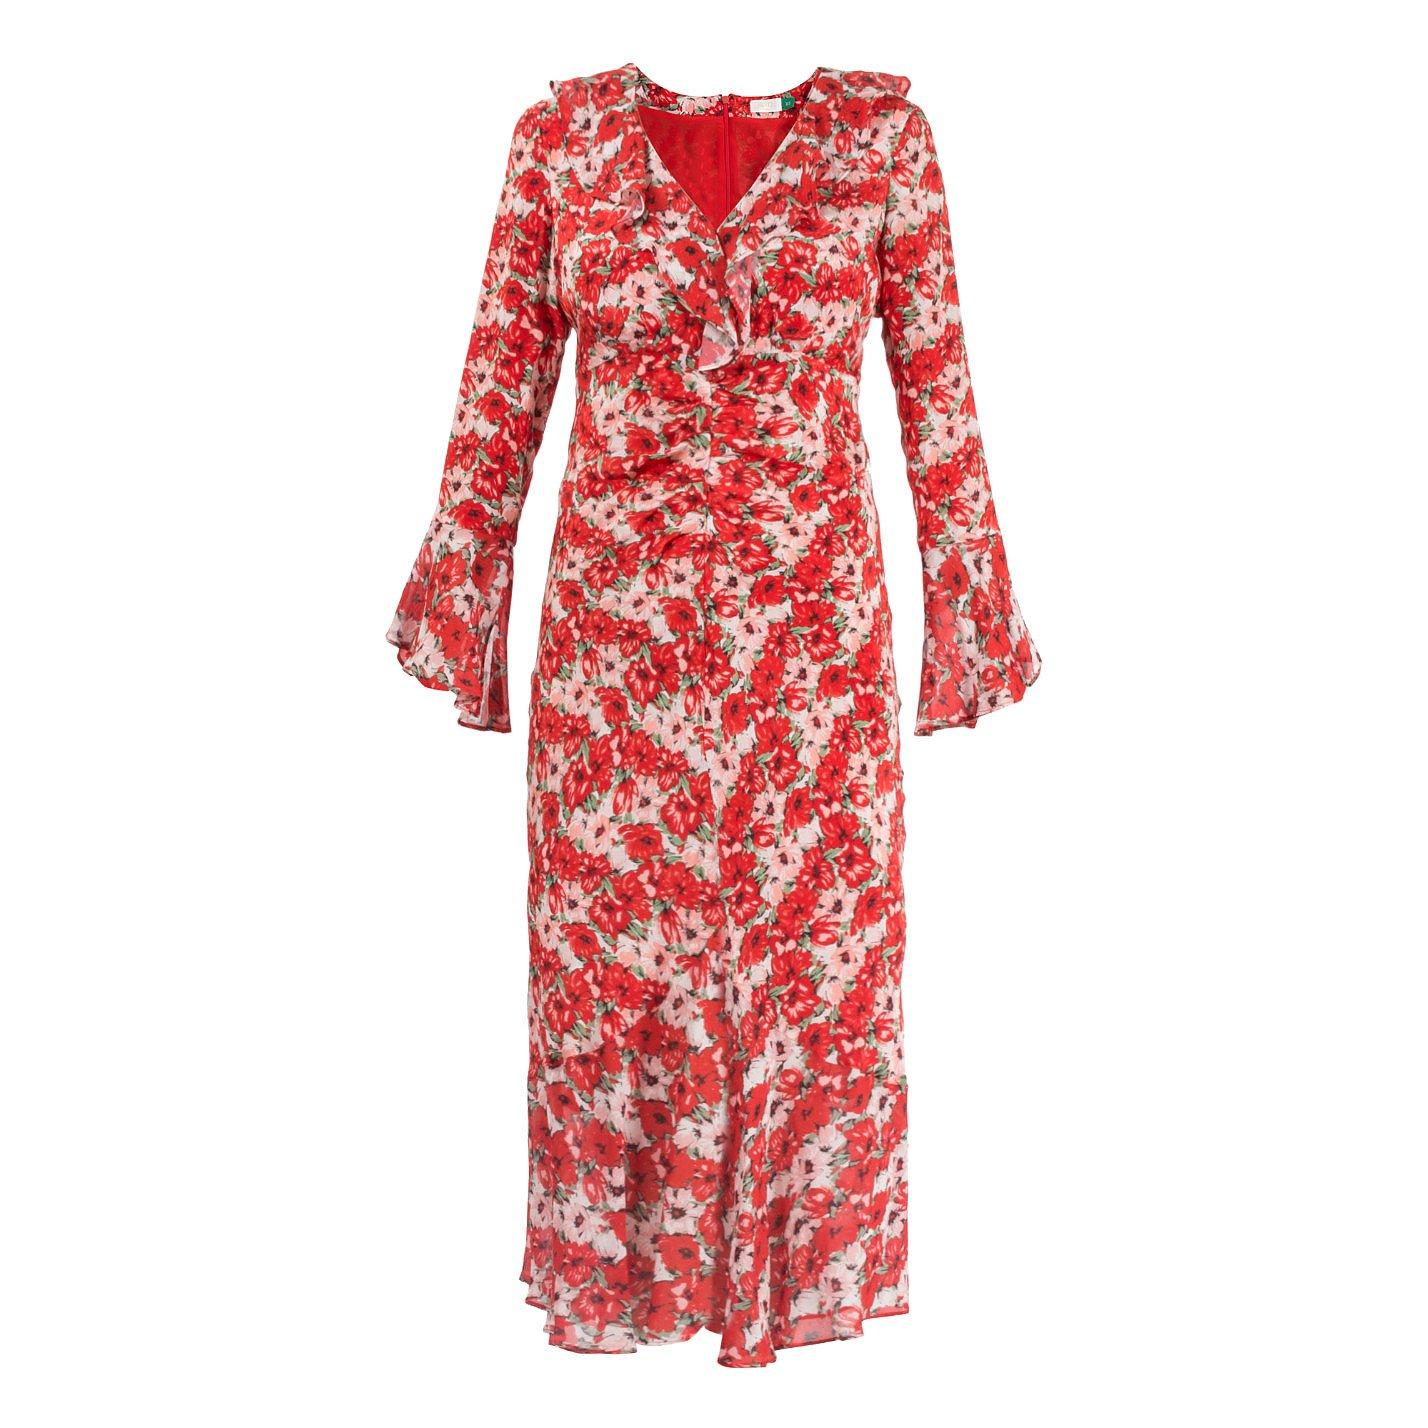 Rixo Coleen Floral Print Dress